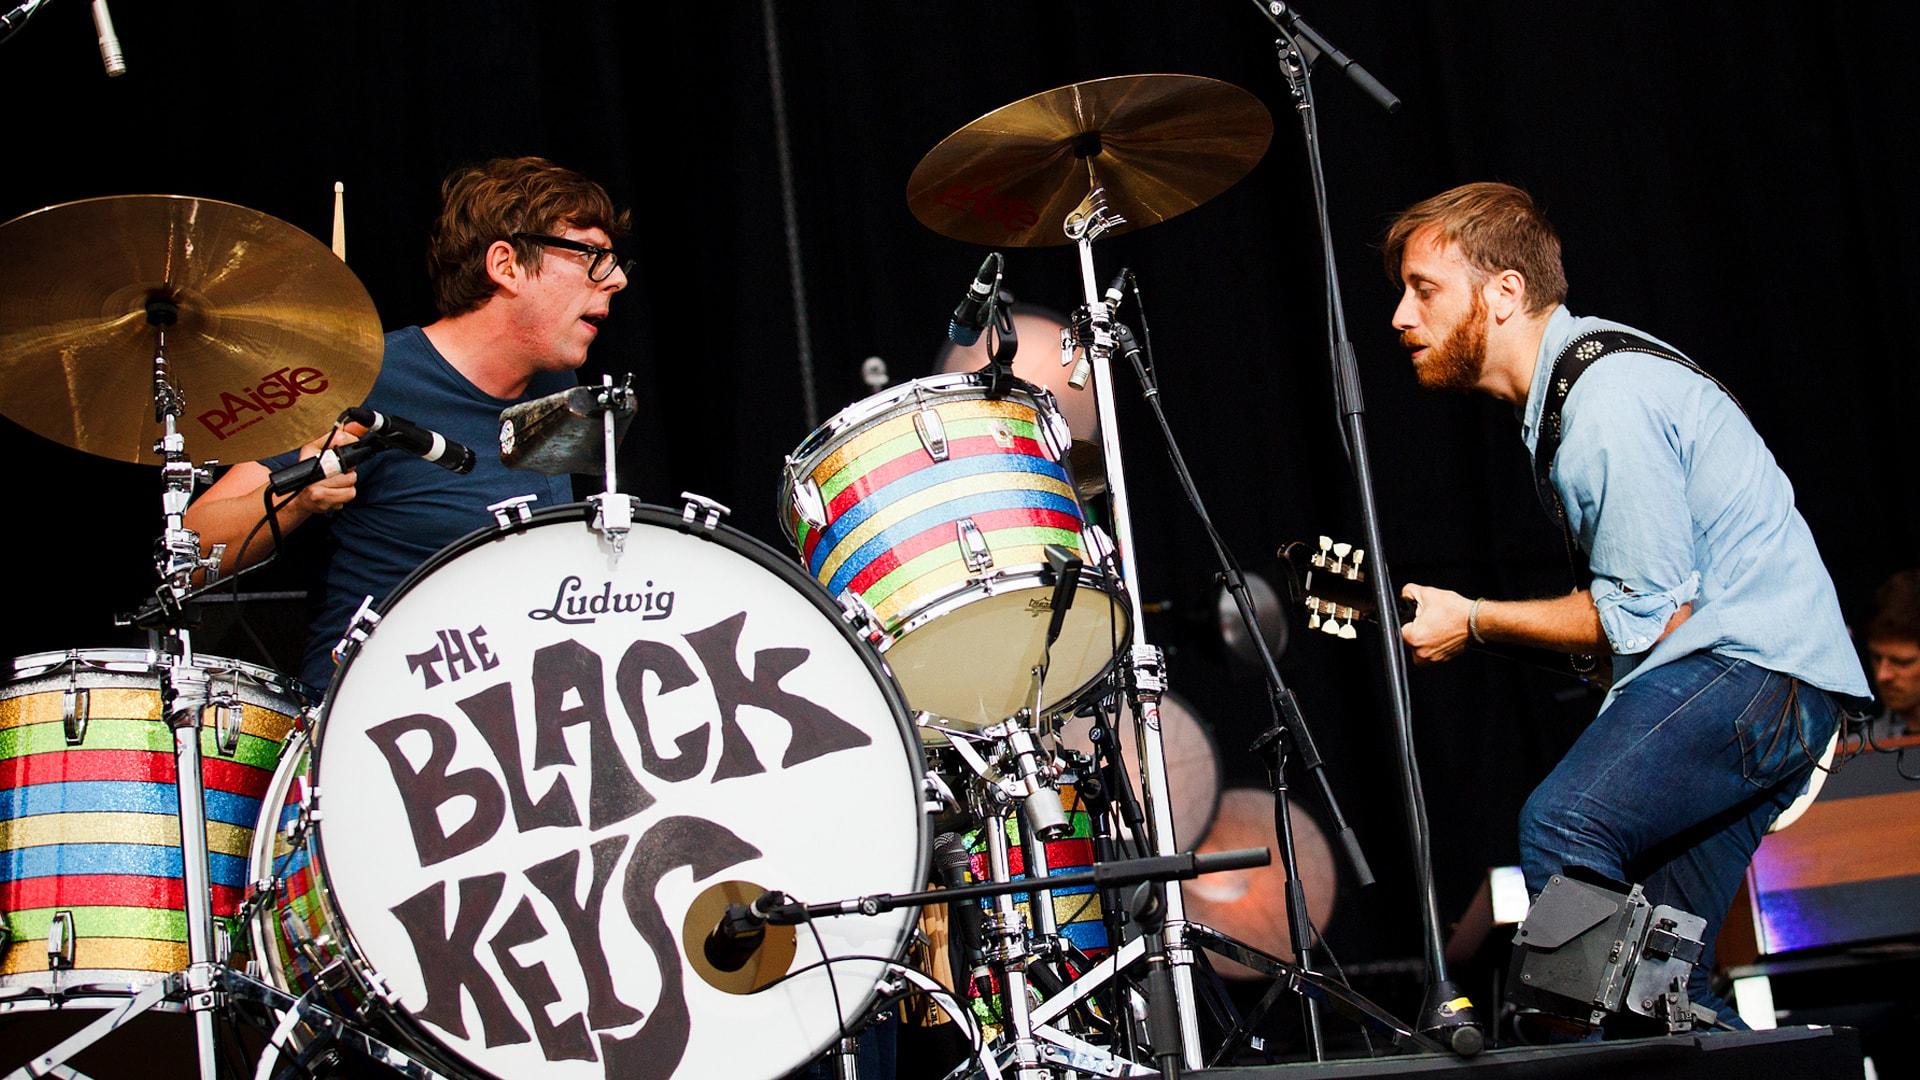 The Black Keys Widescreen